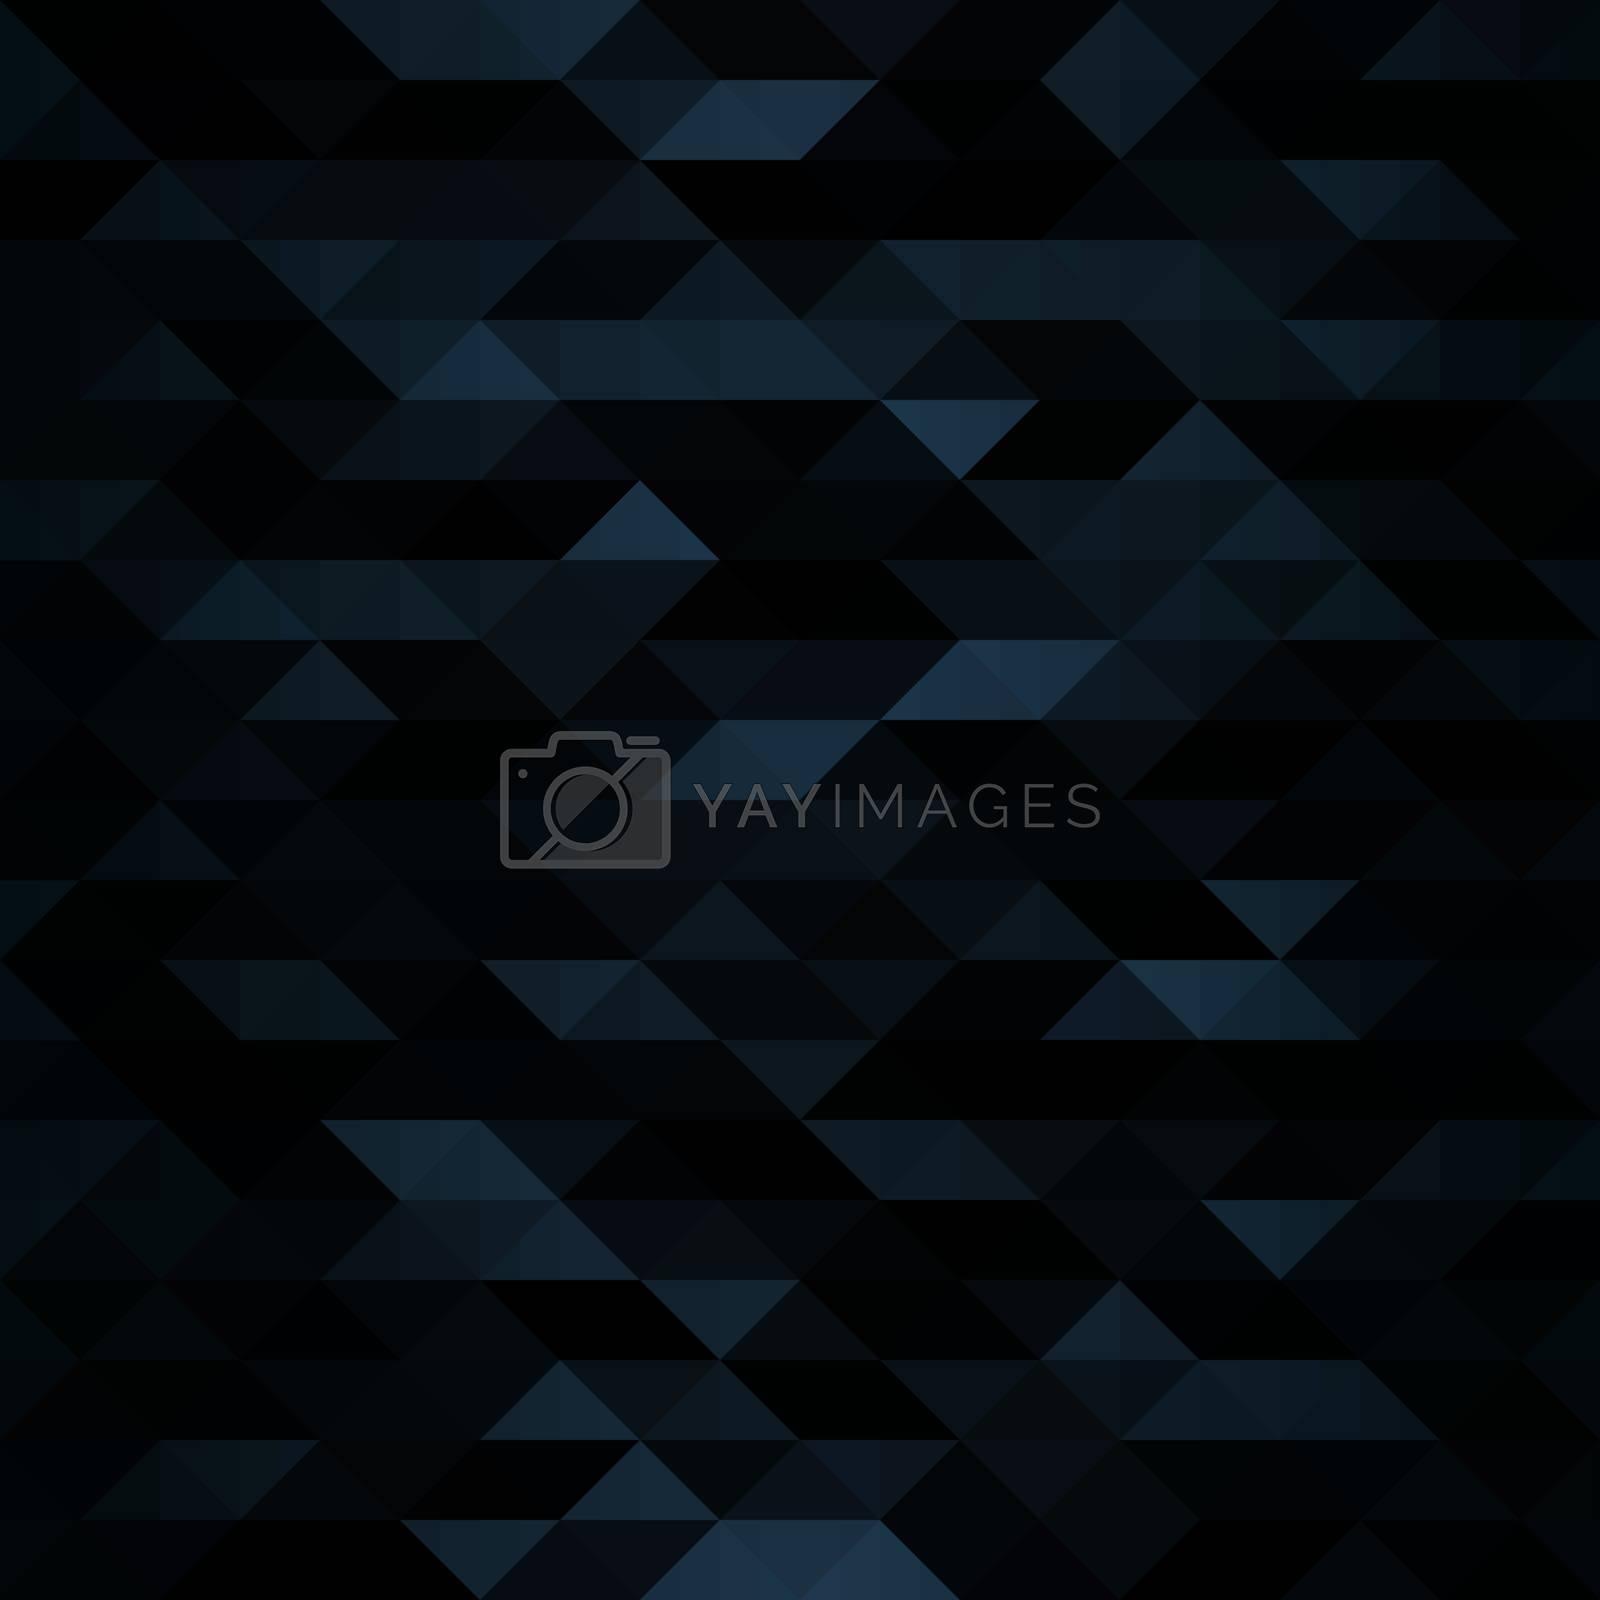 Creative Triangular Polygonal Dark Mosaic Background. Look like coal or futuristic military camouflage. Vector illustration